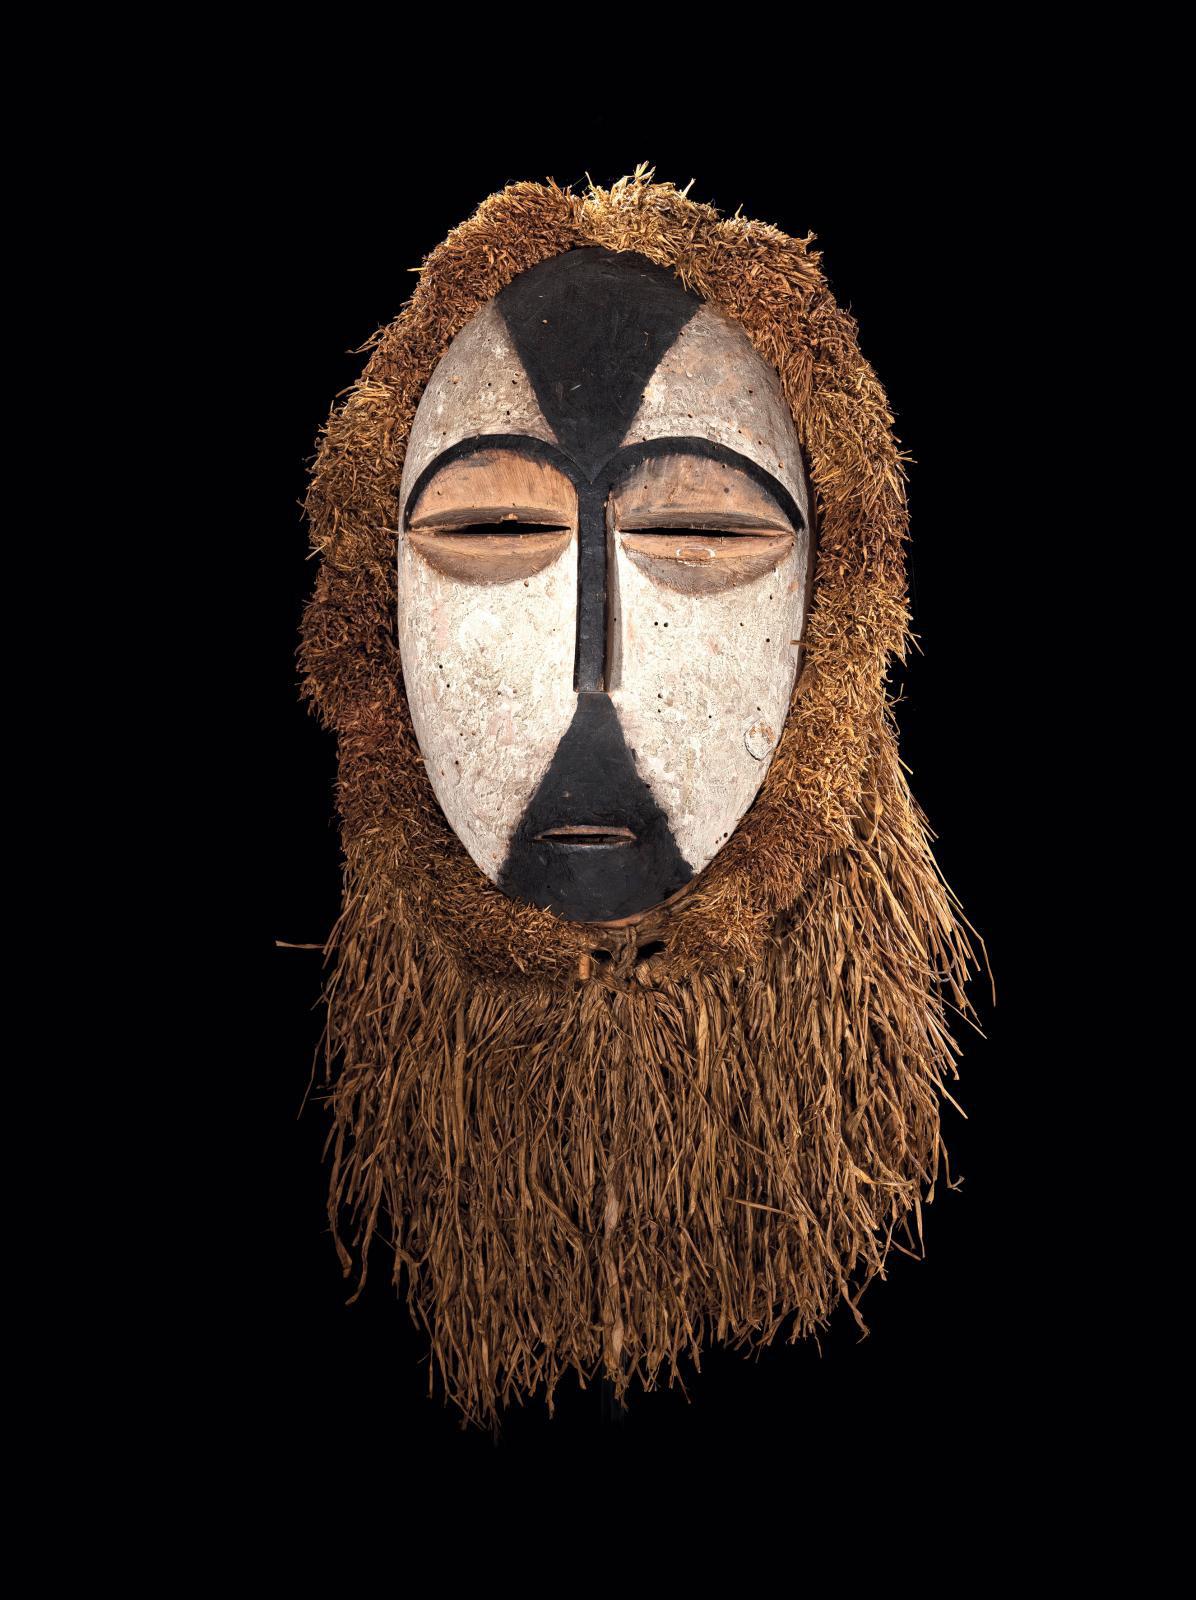 Gabon, 19th century, Galoa people, Okukwe mask, wood, black and white pigments, raffia, h. 27 cm/10.62 in. Galerie Patrik Fröhlich.Courtes